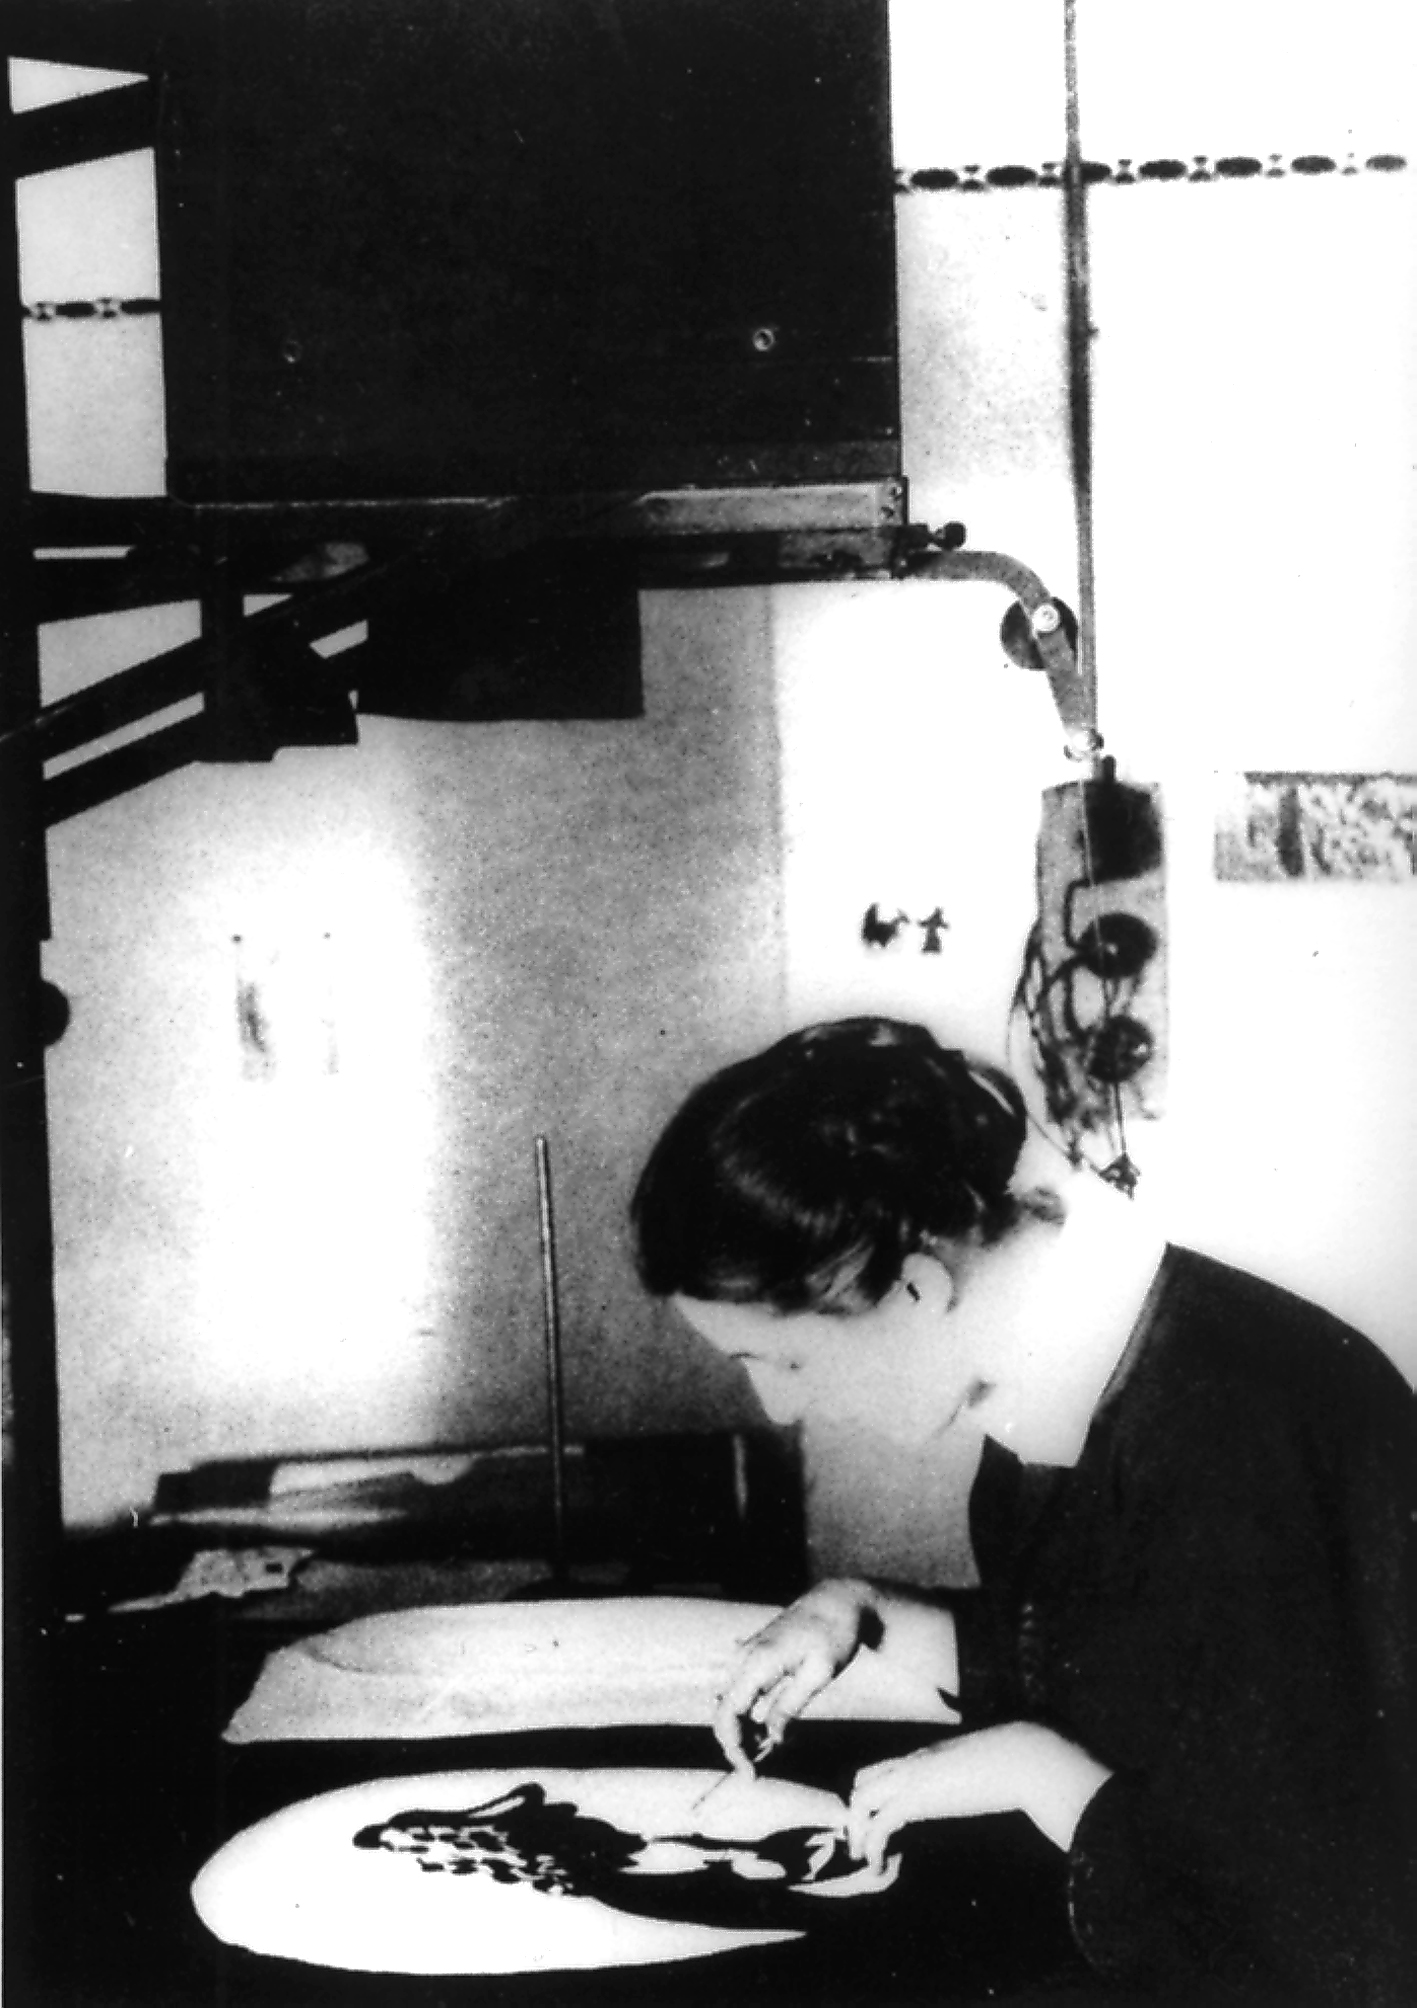 Lotte_Reiniger_1922